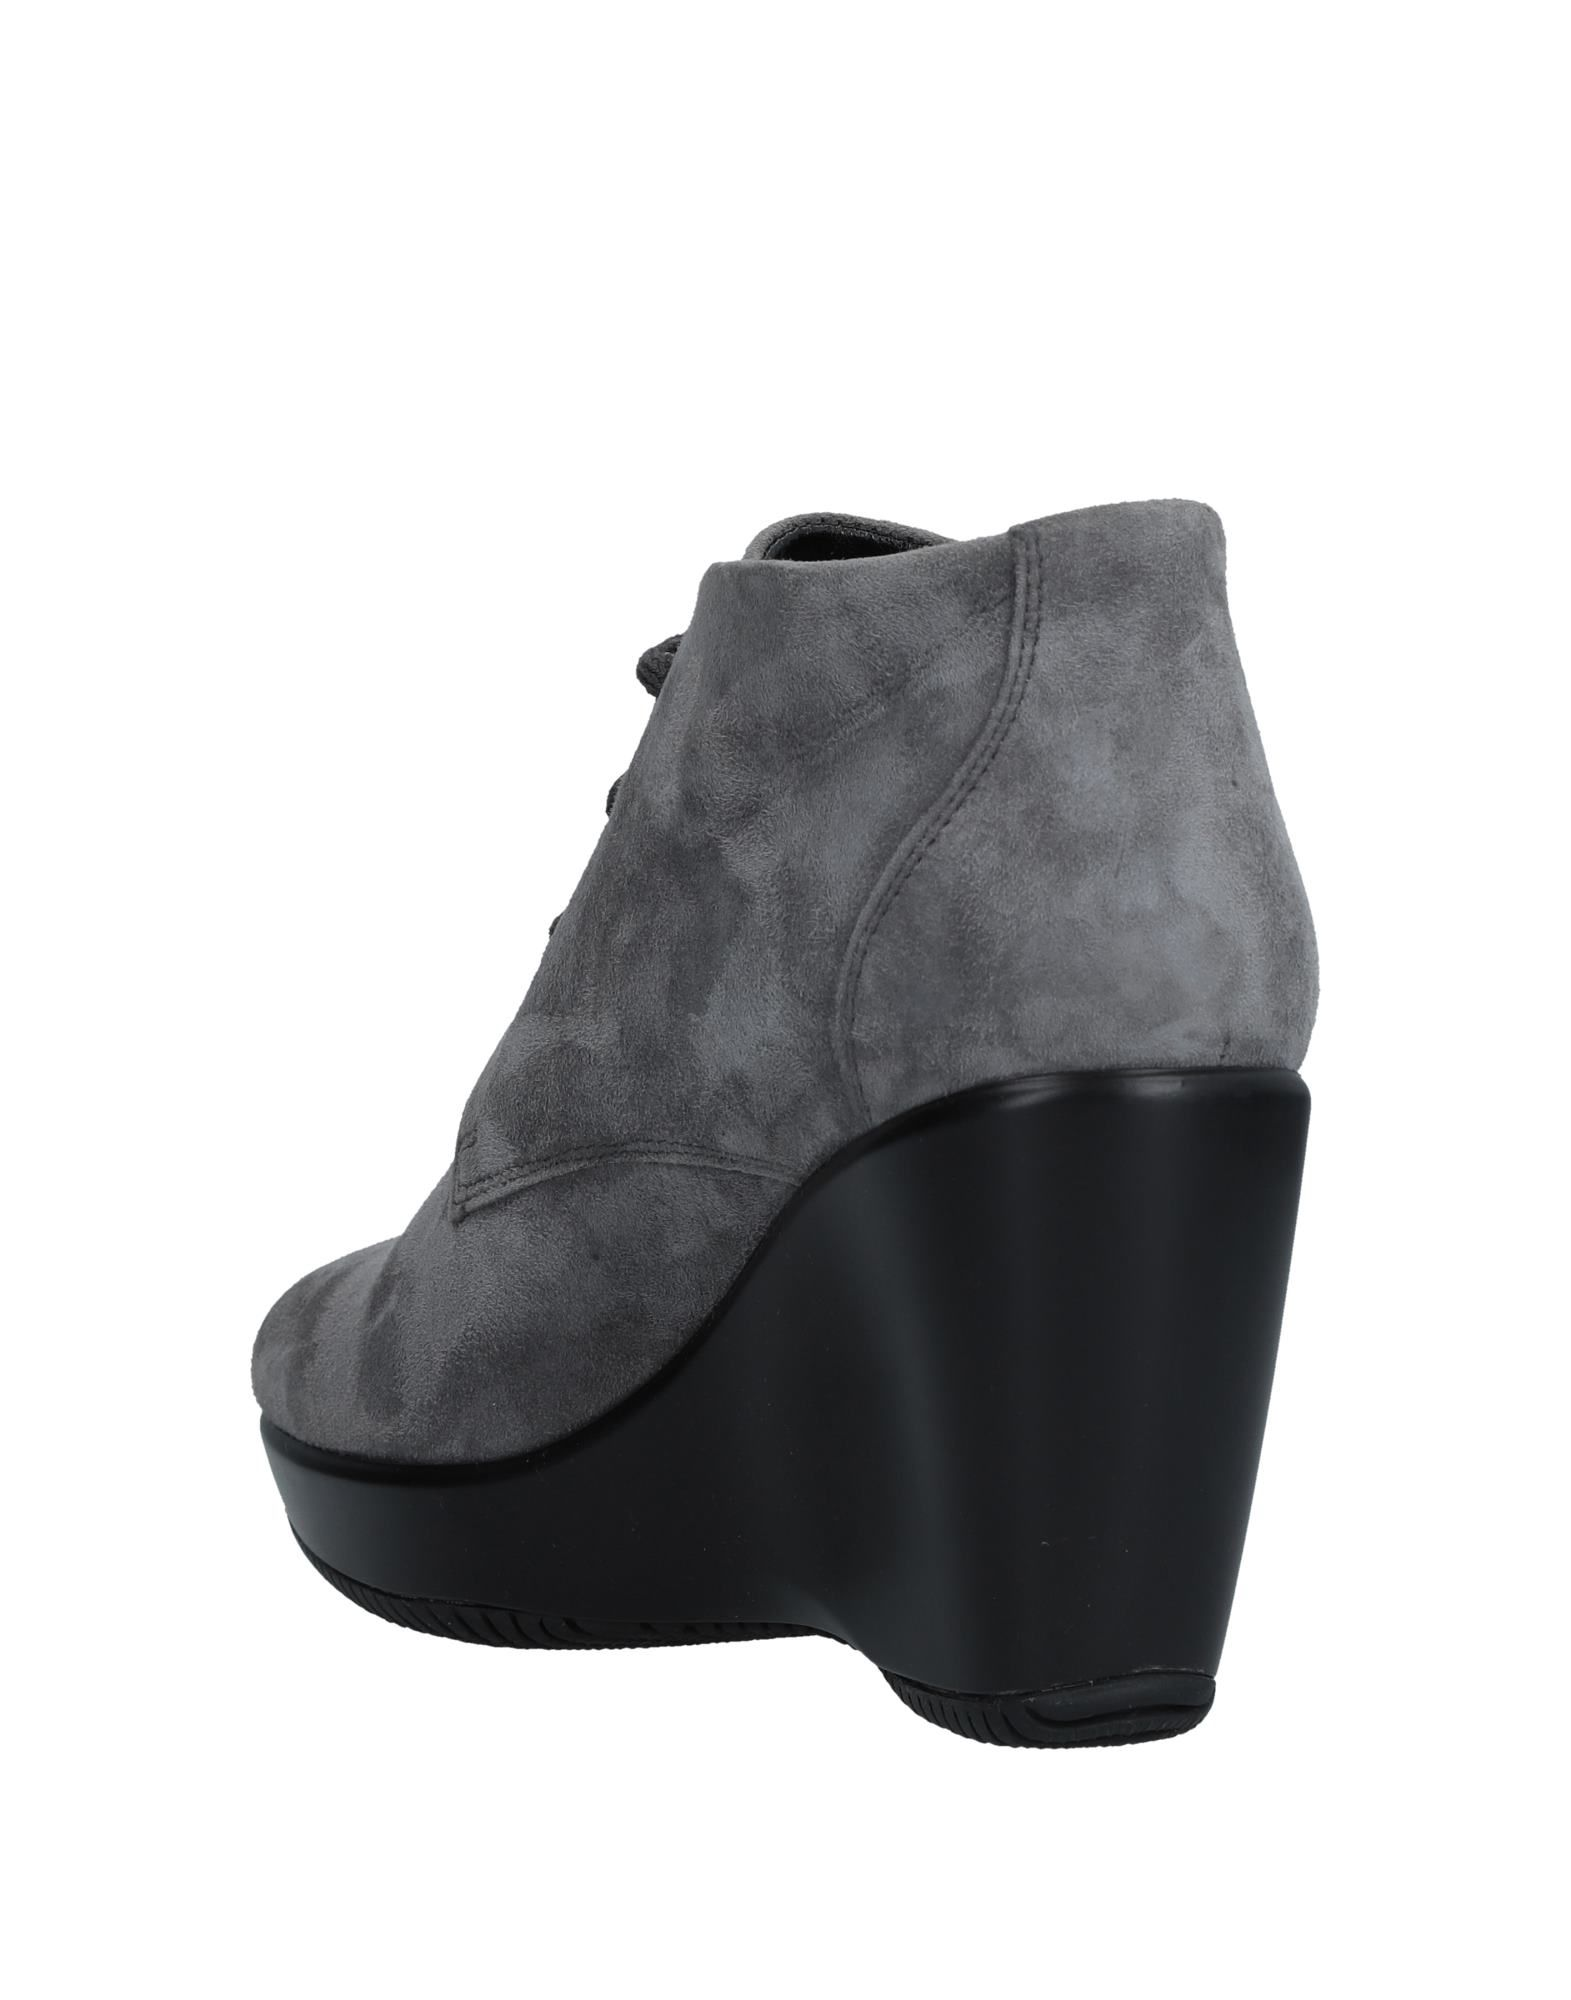 Stilvolle billige Schuhe Hogan Stiefelette 11200006VJ Damen  11200006VJ Stiefelette f929e7